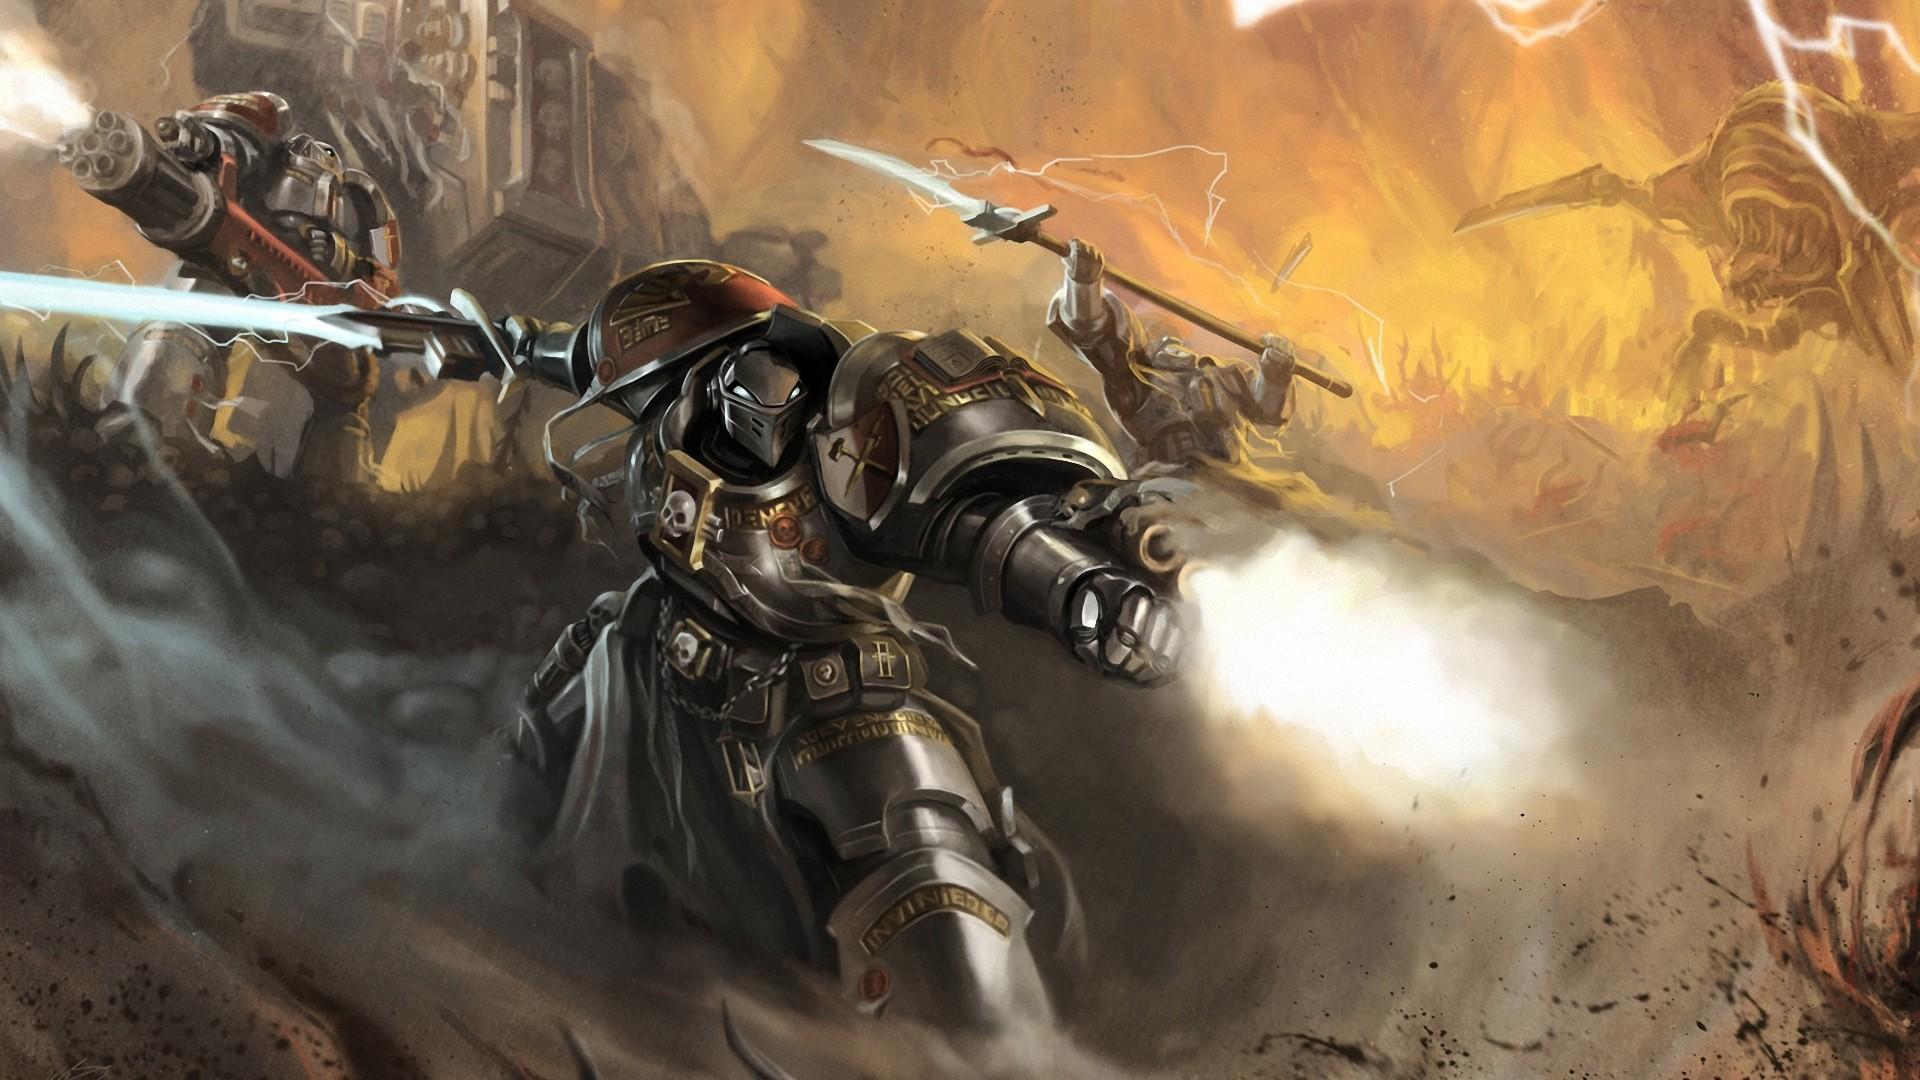 Preview wallpaper okita, warhammer 40k, space marines, robot, weapon, sword,